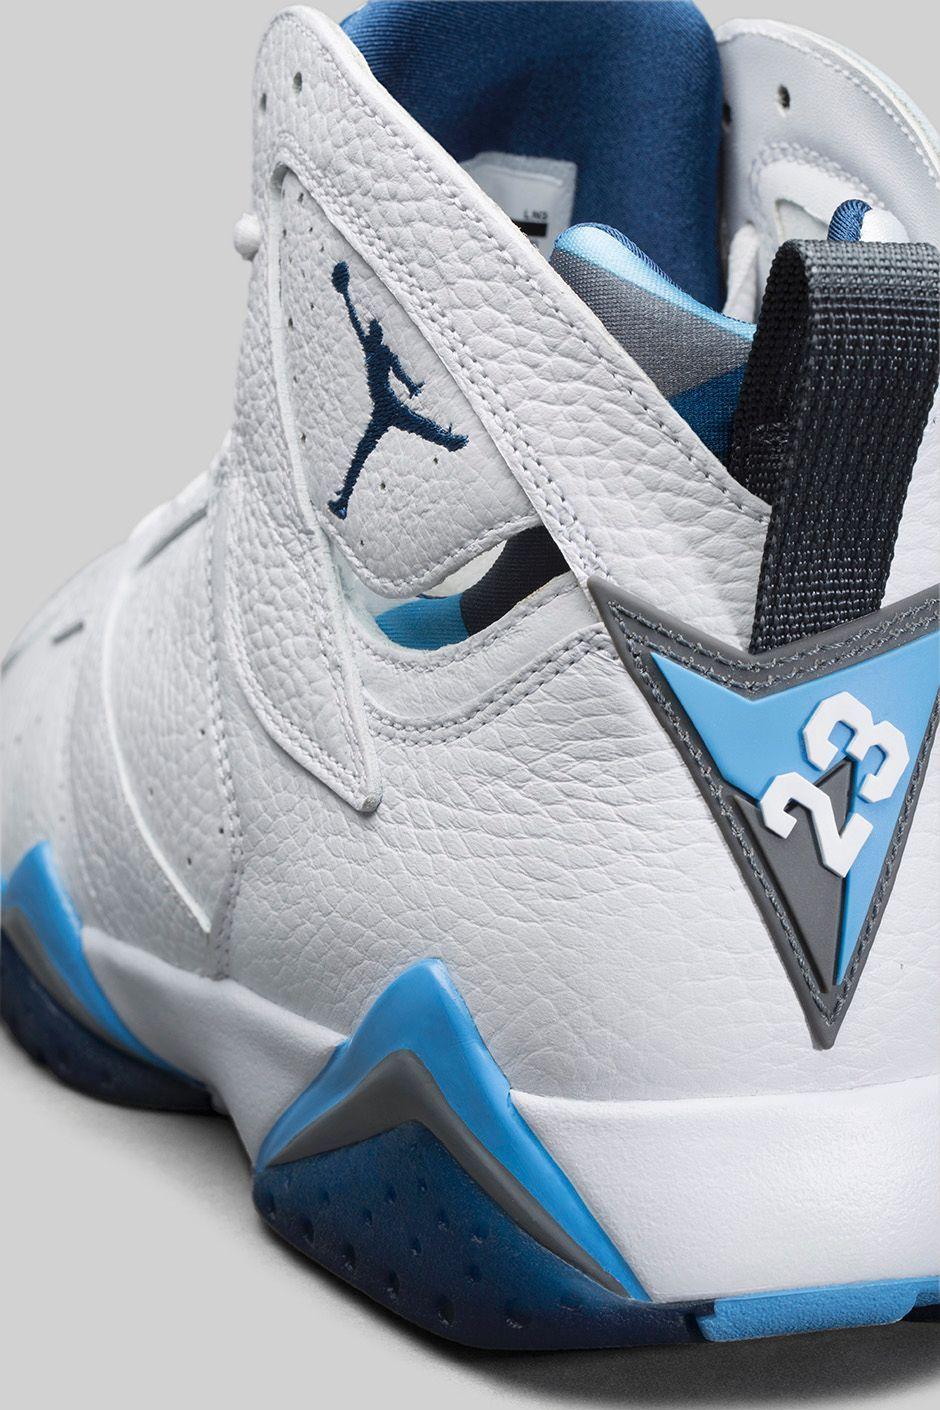 337aadaad91 Air-Jordan-7-Retro-French-Blue | J's On My Feet | Zapatillas jordan ...